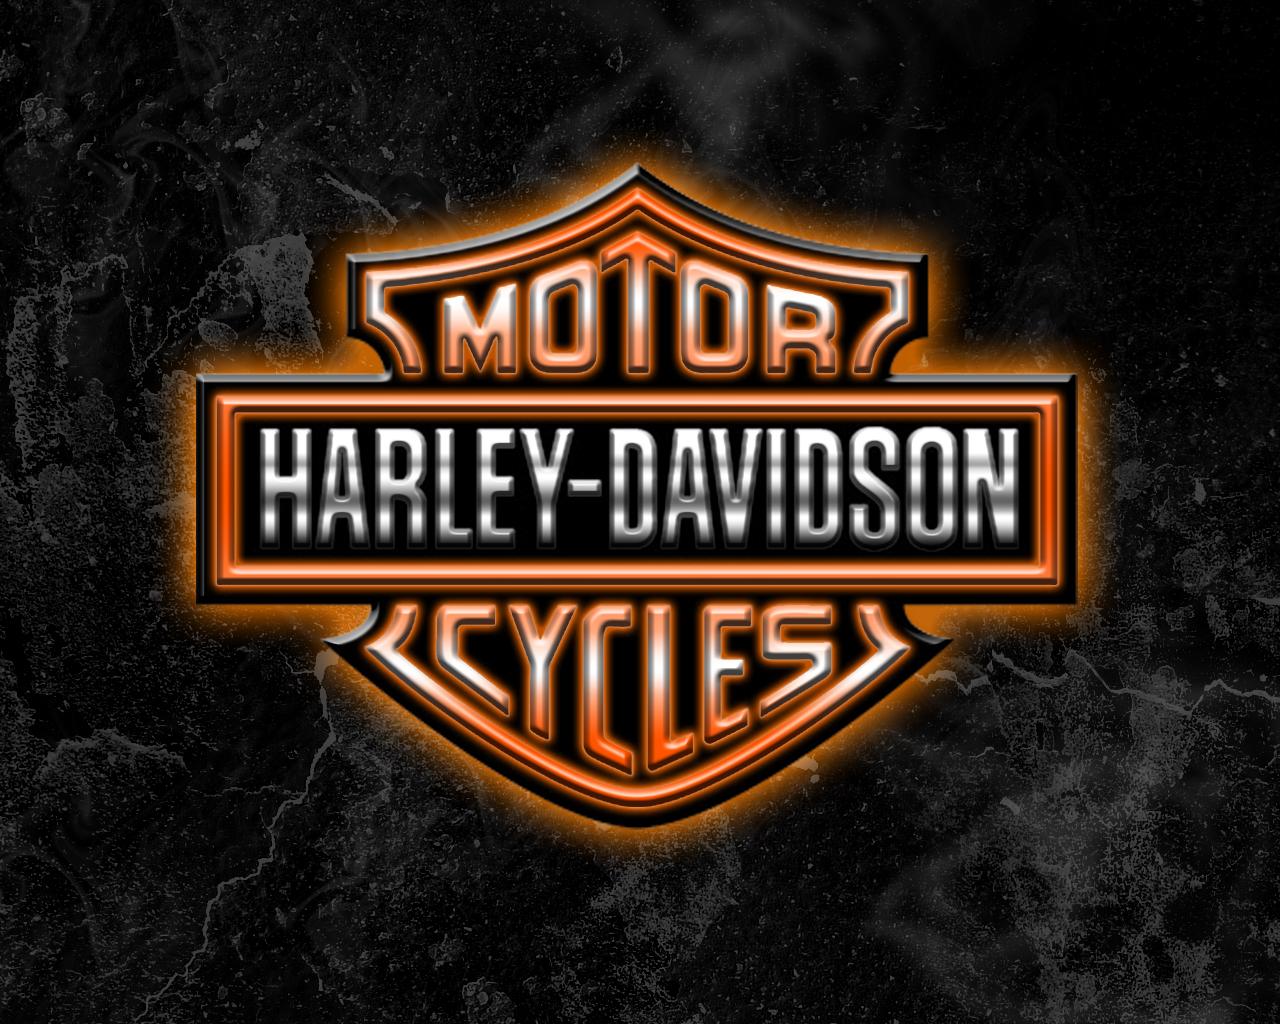 Unofficial Desktop Wallpapers Harley Davidson Forums